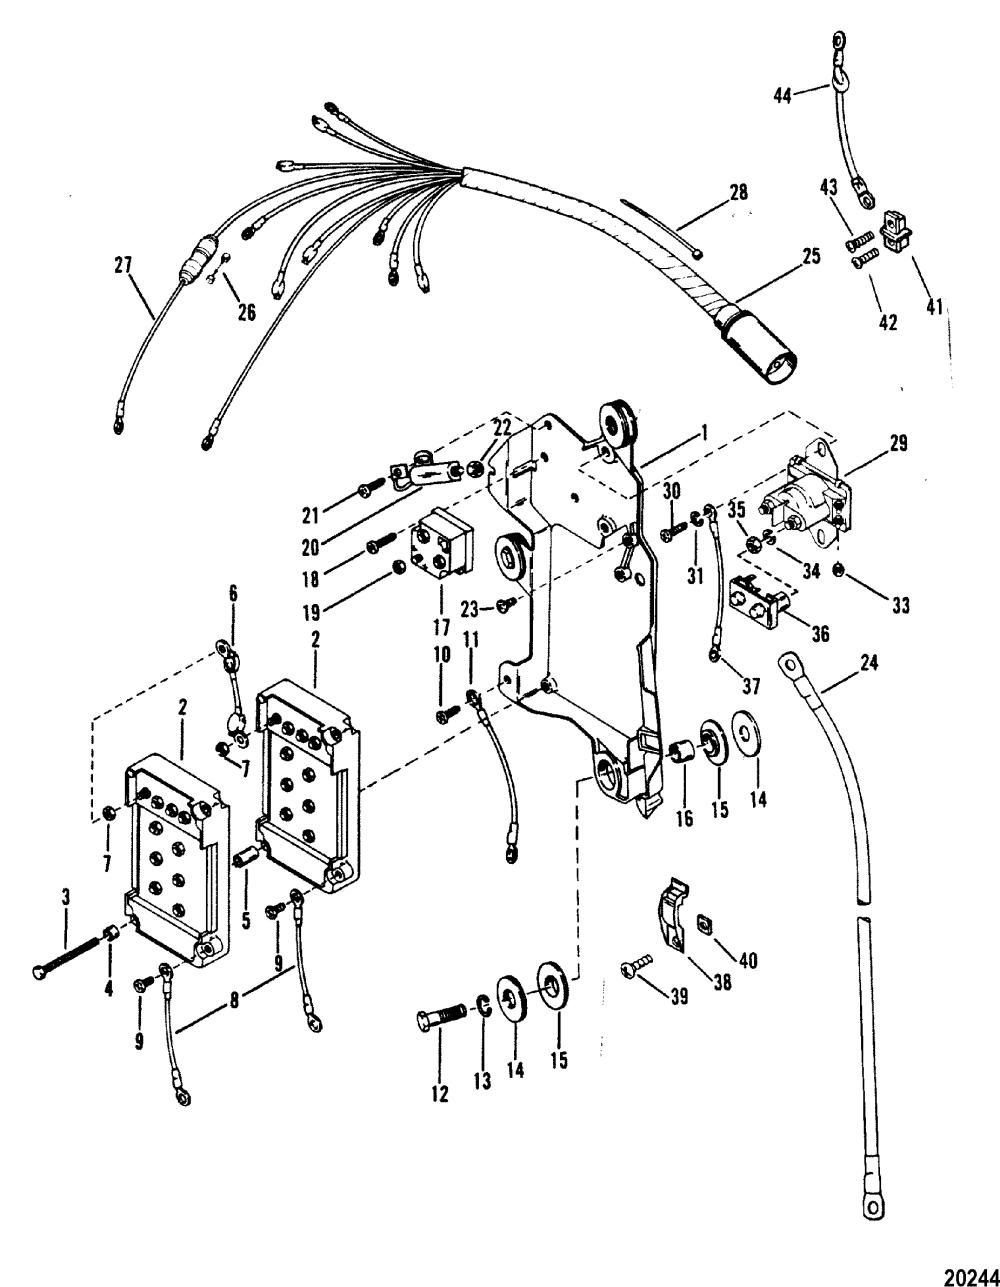 medium resolution of mercury mariner v 150 marathon 5600162 thru 0a904645 wiring harness starter solenoid and rectifier